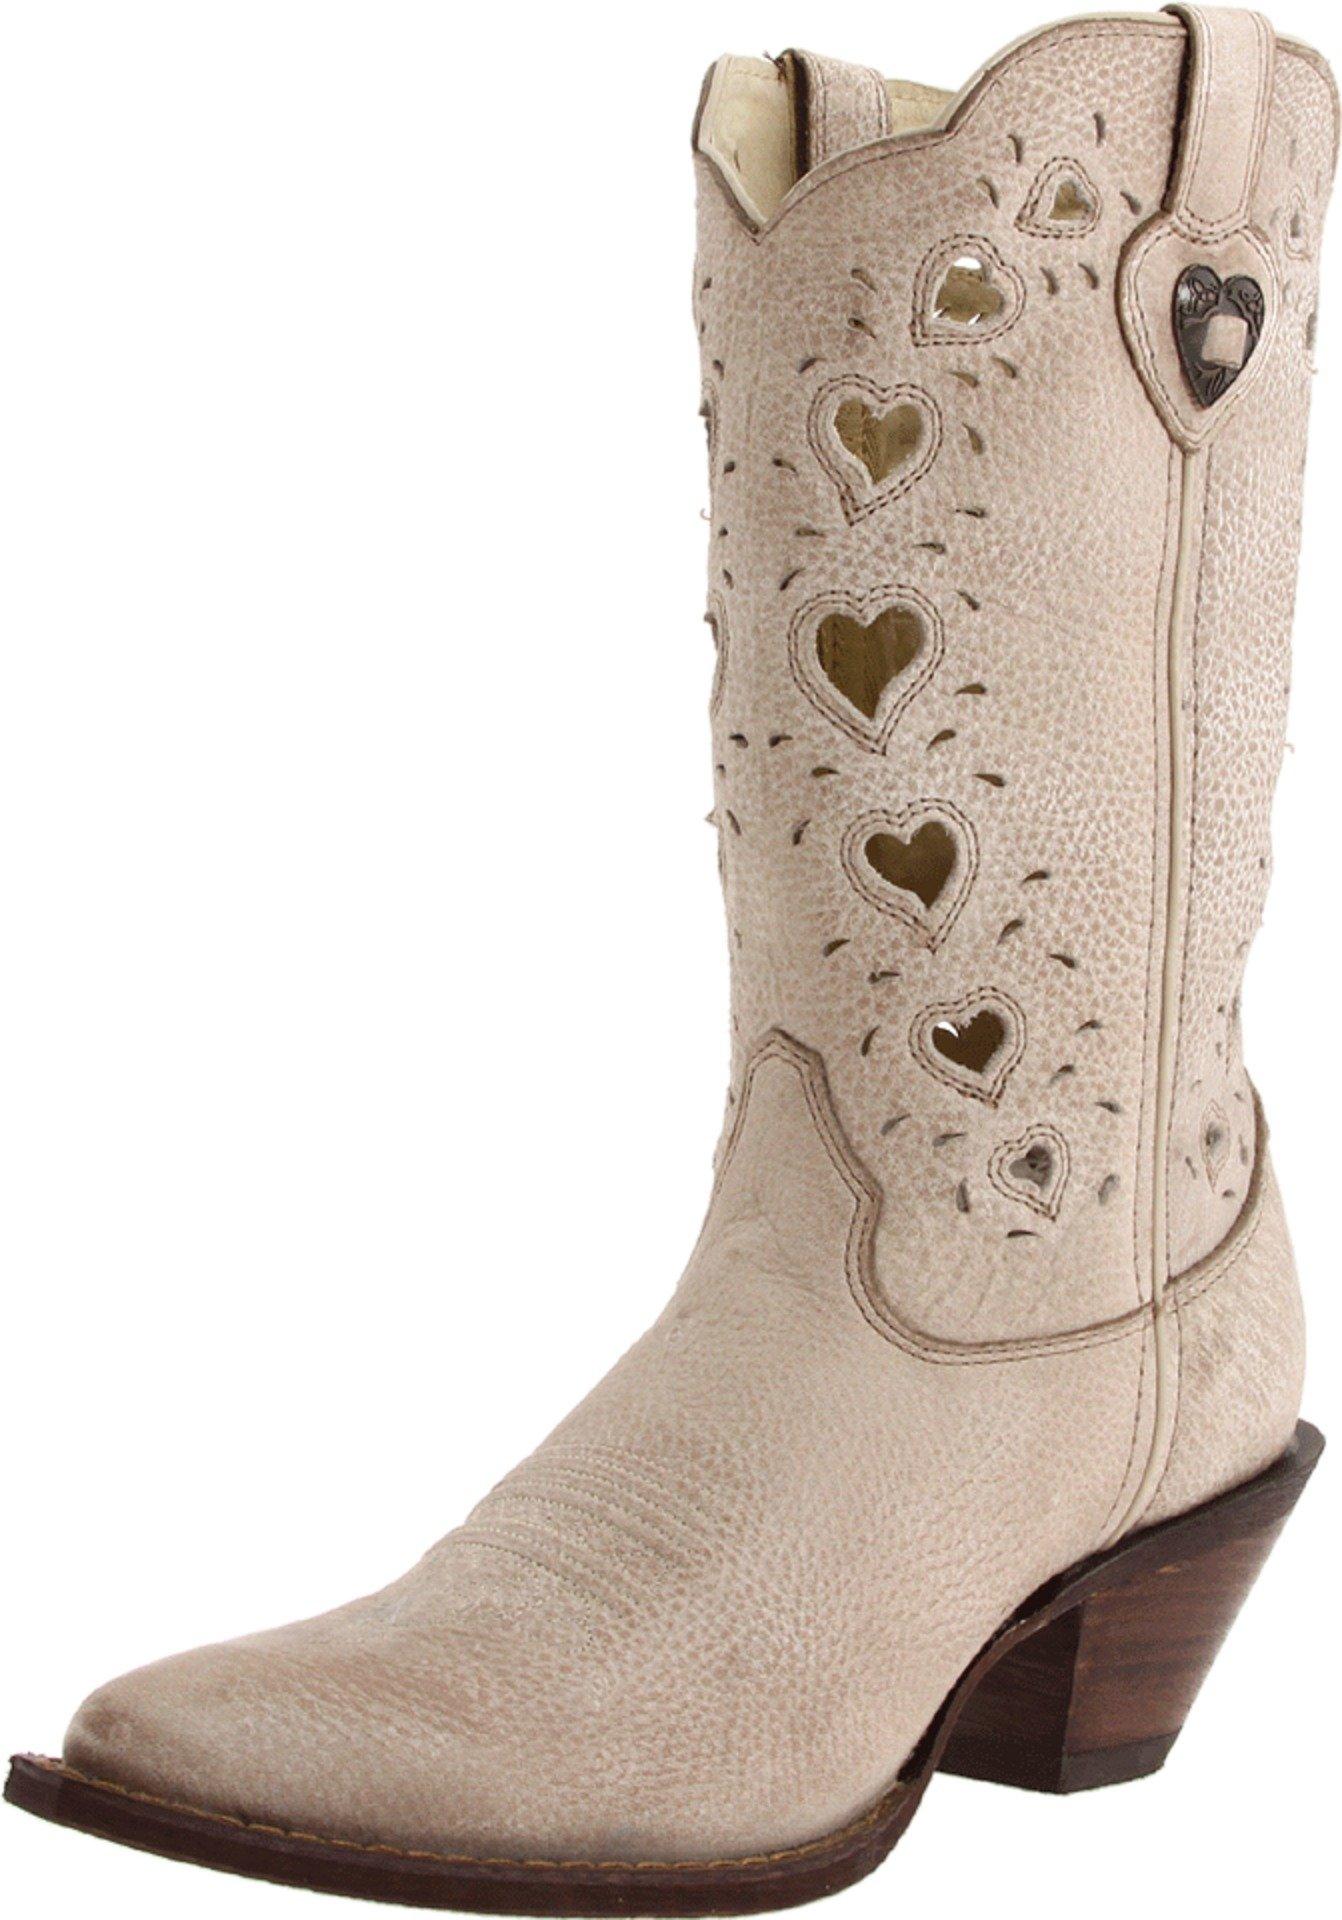 Durango Women's Crush Heart Western Boot,Beige,6.5 B US